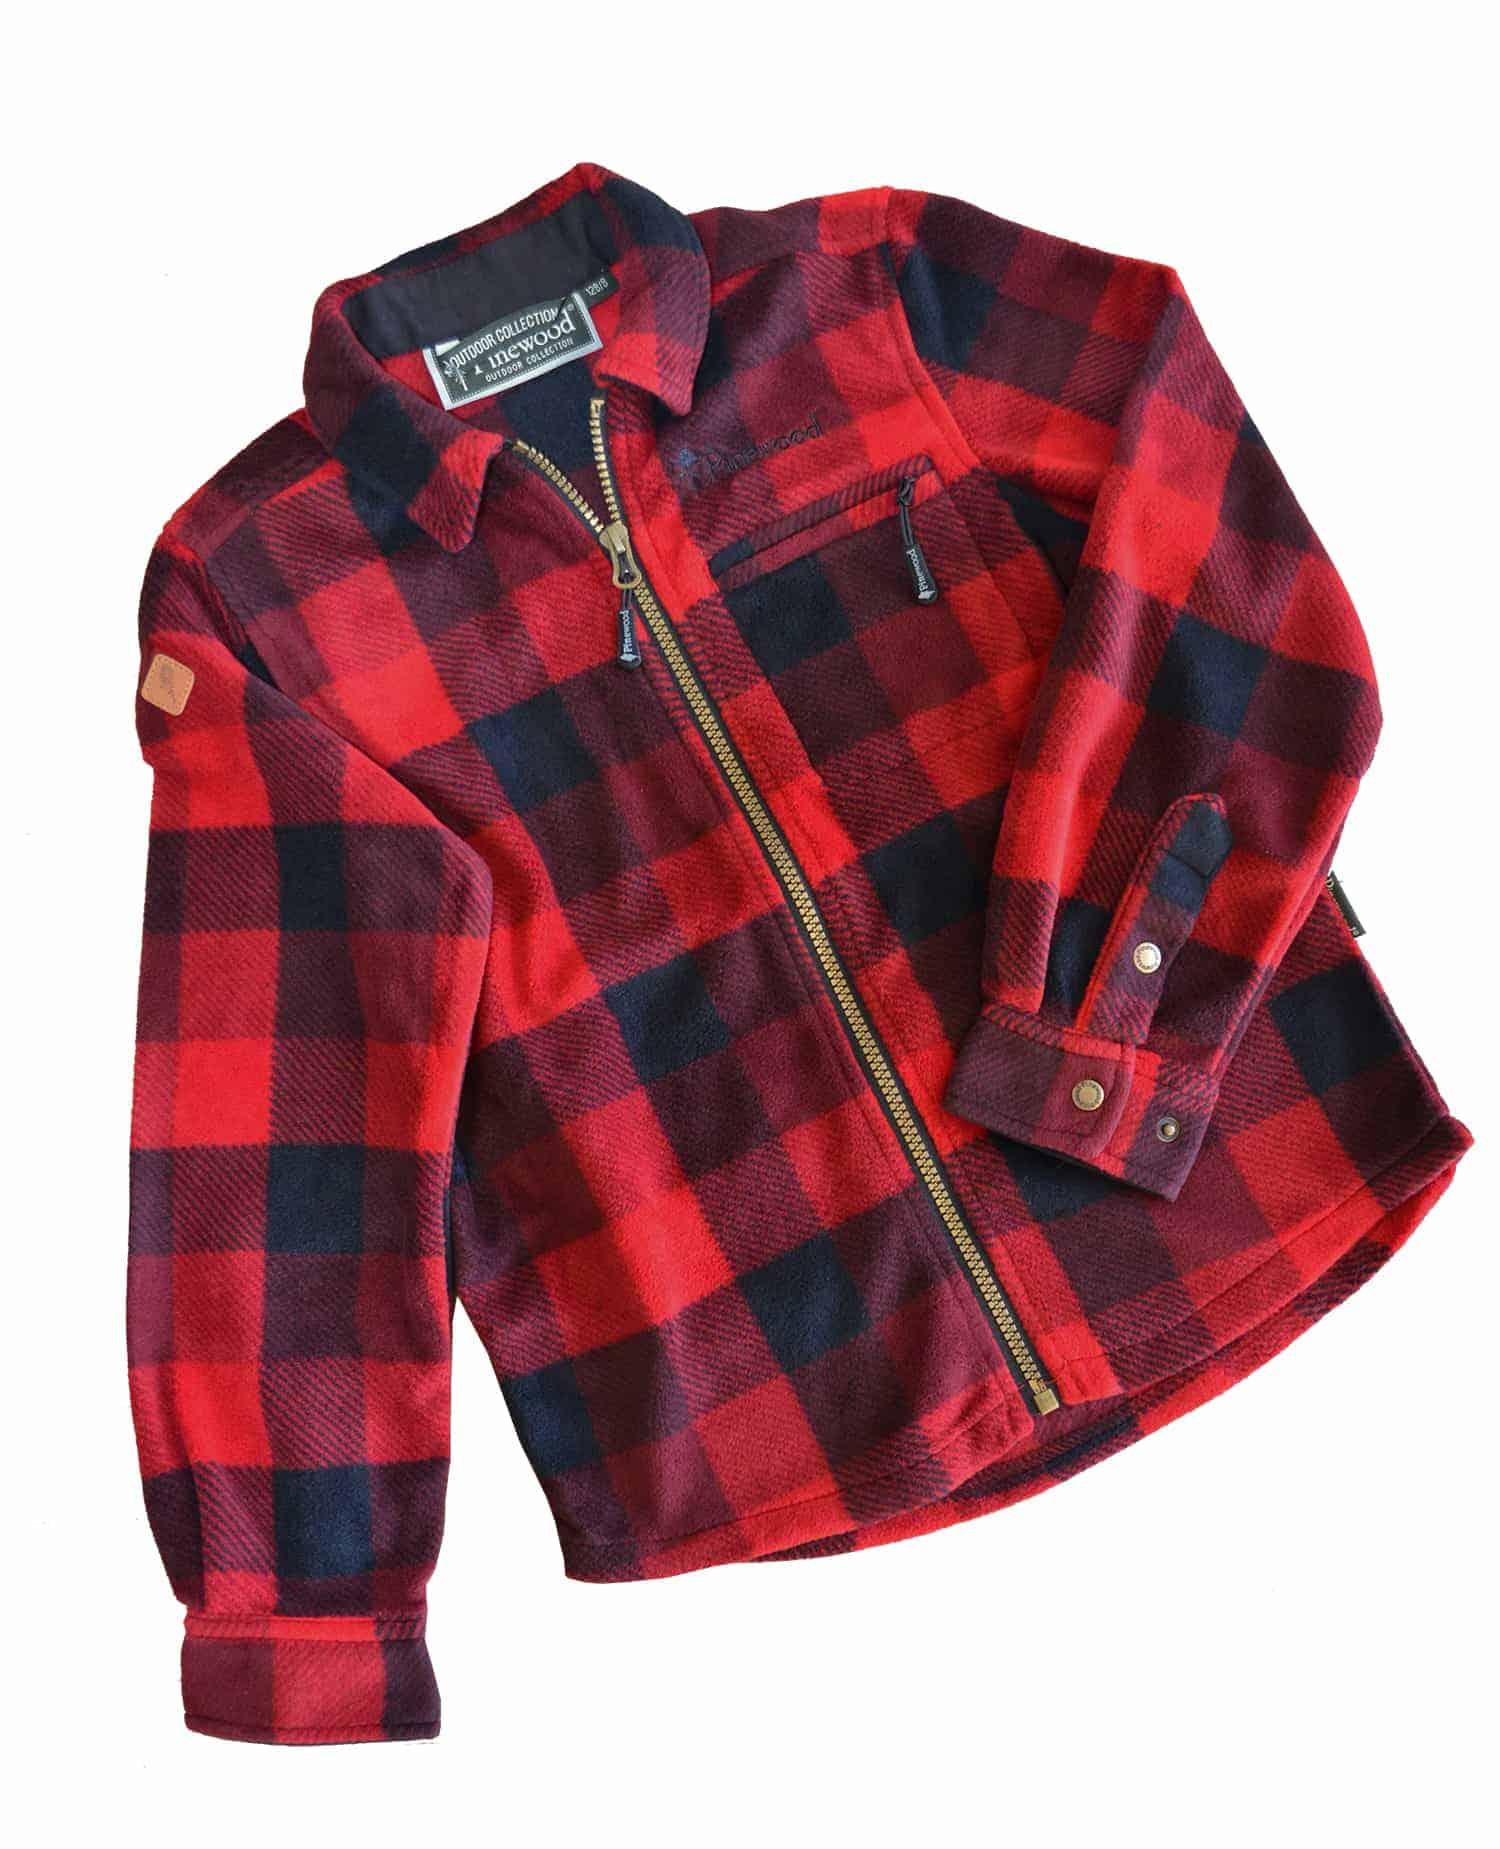 4fb4bef8 Fleece skjorte Kanada - Junior Grej skjorter og fleece trøjer til børn